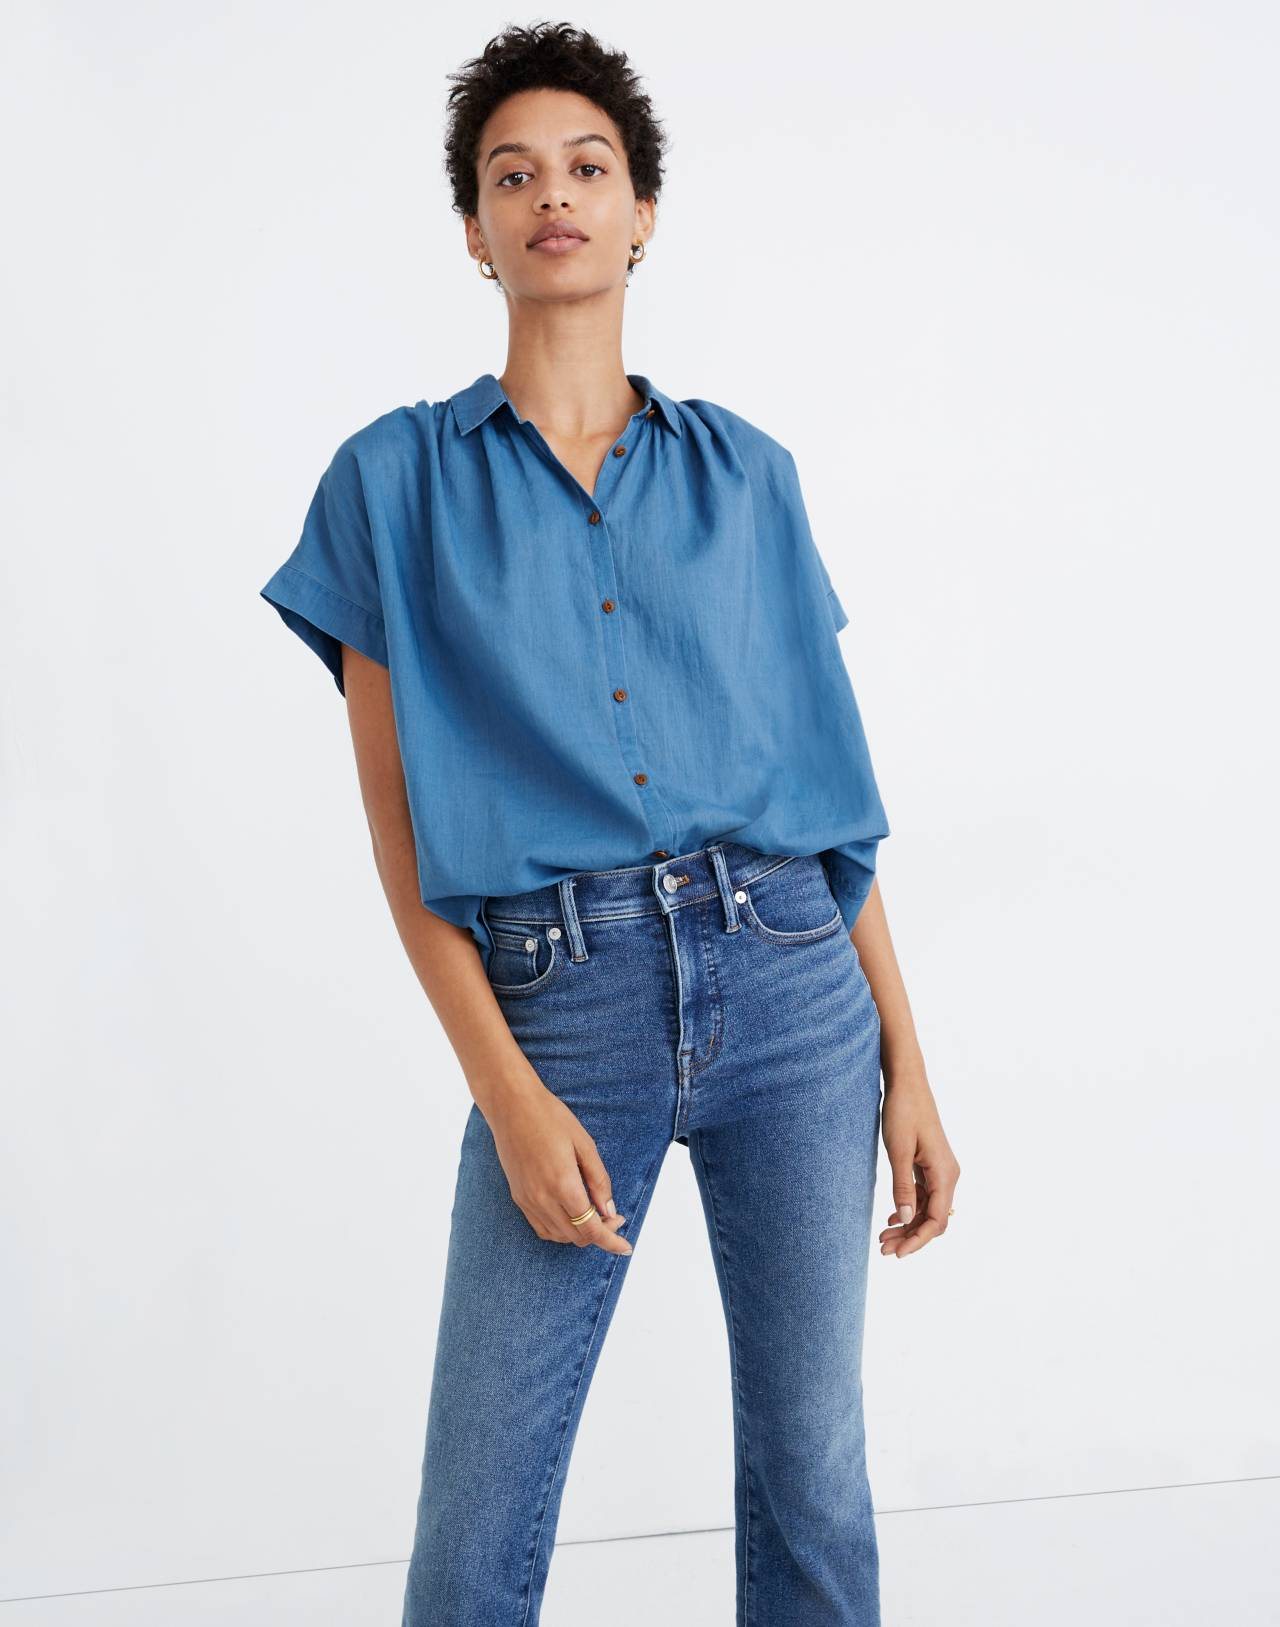 Central Shirt in Bright Indigo in bright indigo image 1